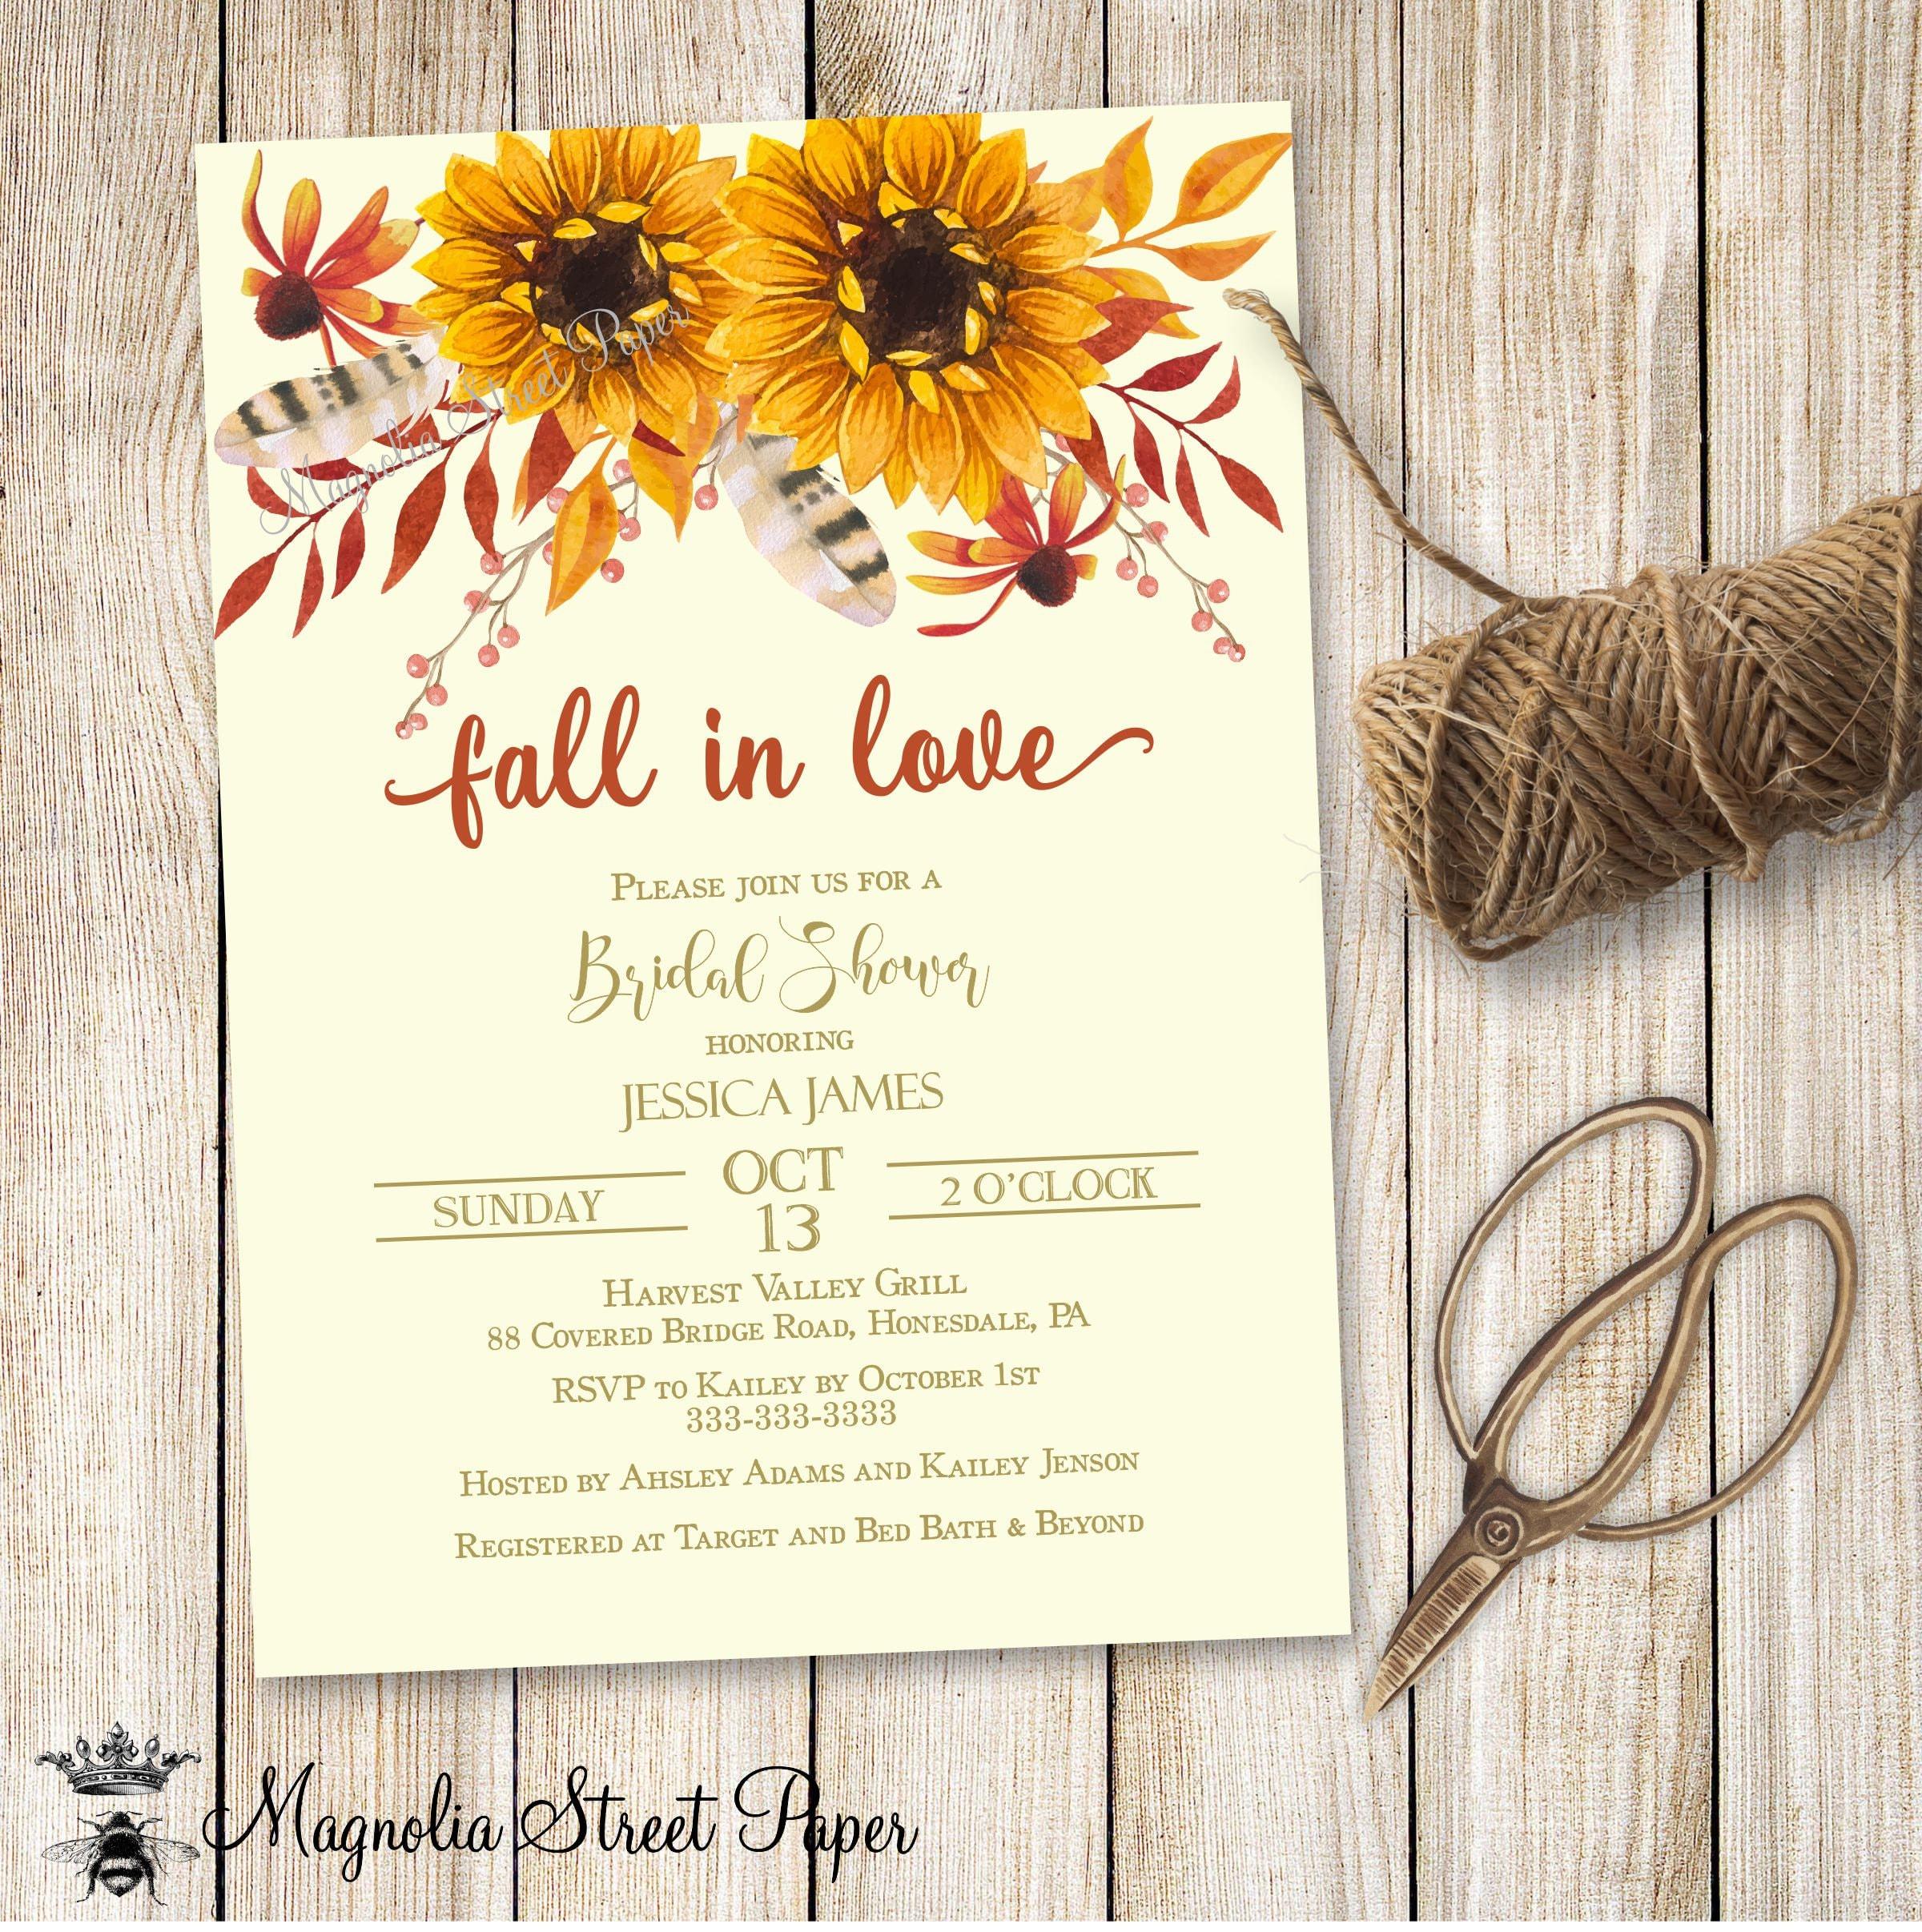 Fall in love bridal shower invitation sunflower bridal shower zoom filmwisefo Gallery